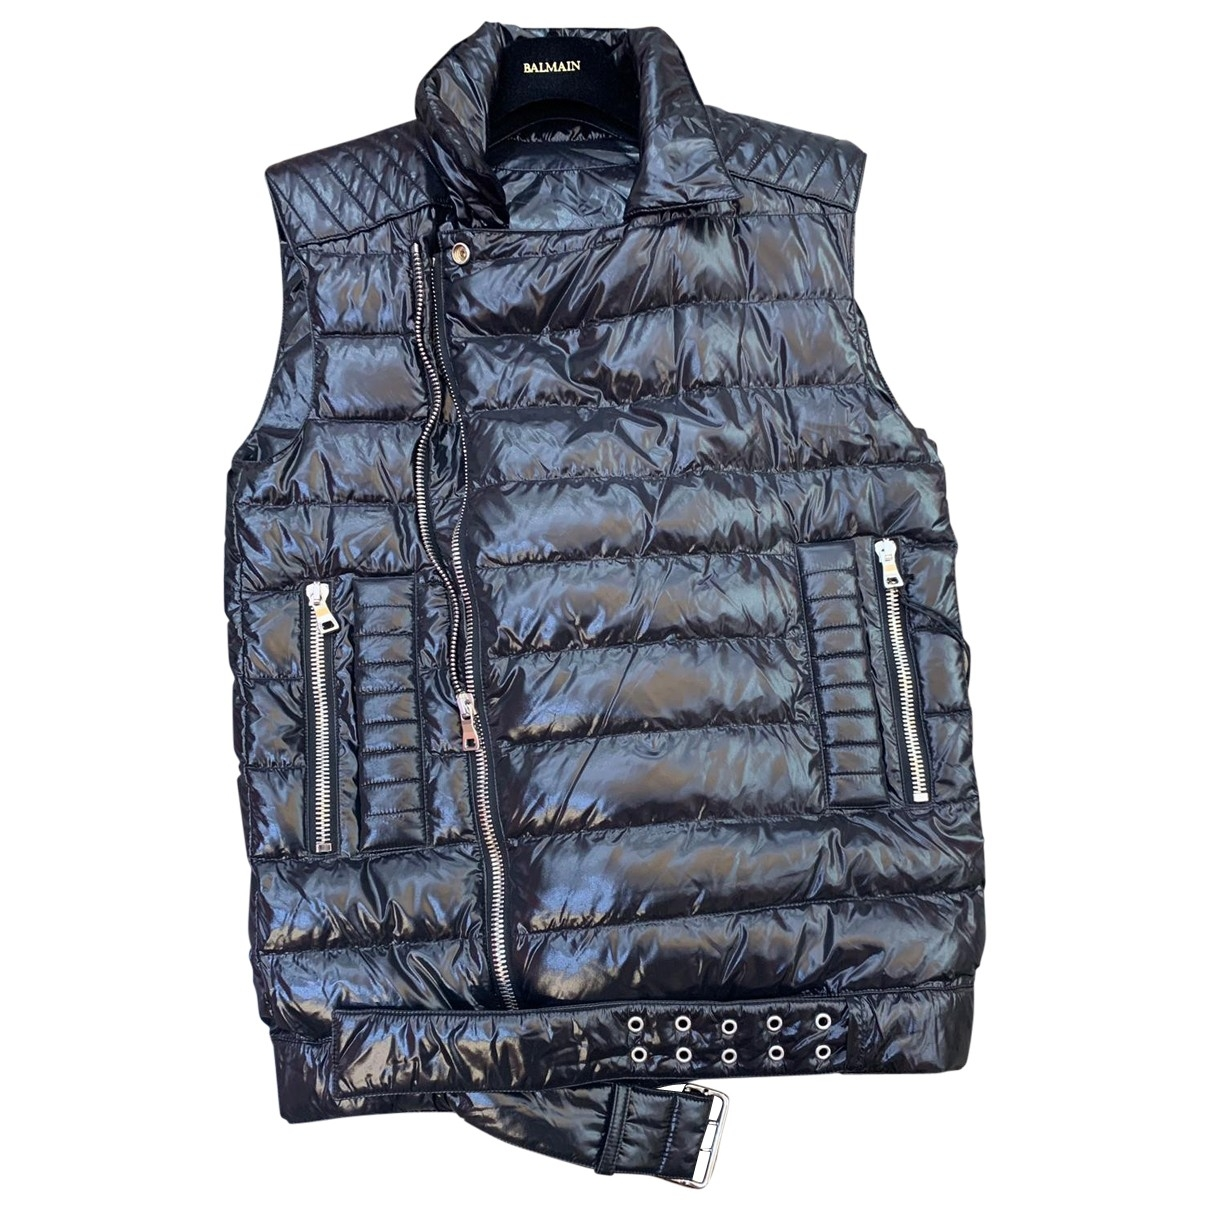 Balmain - Manteau   pour homme - marine